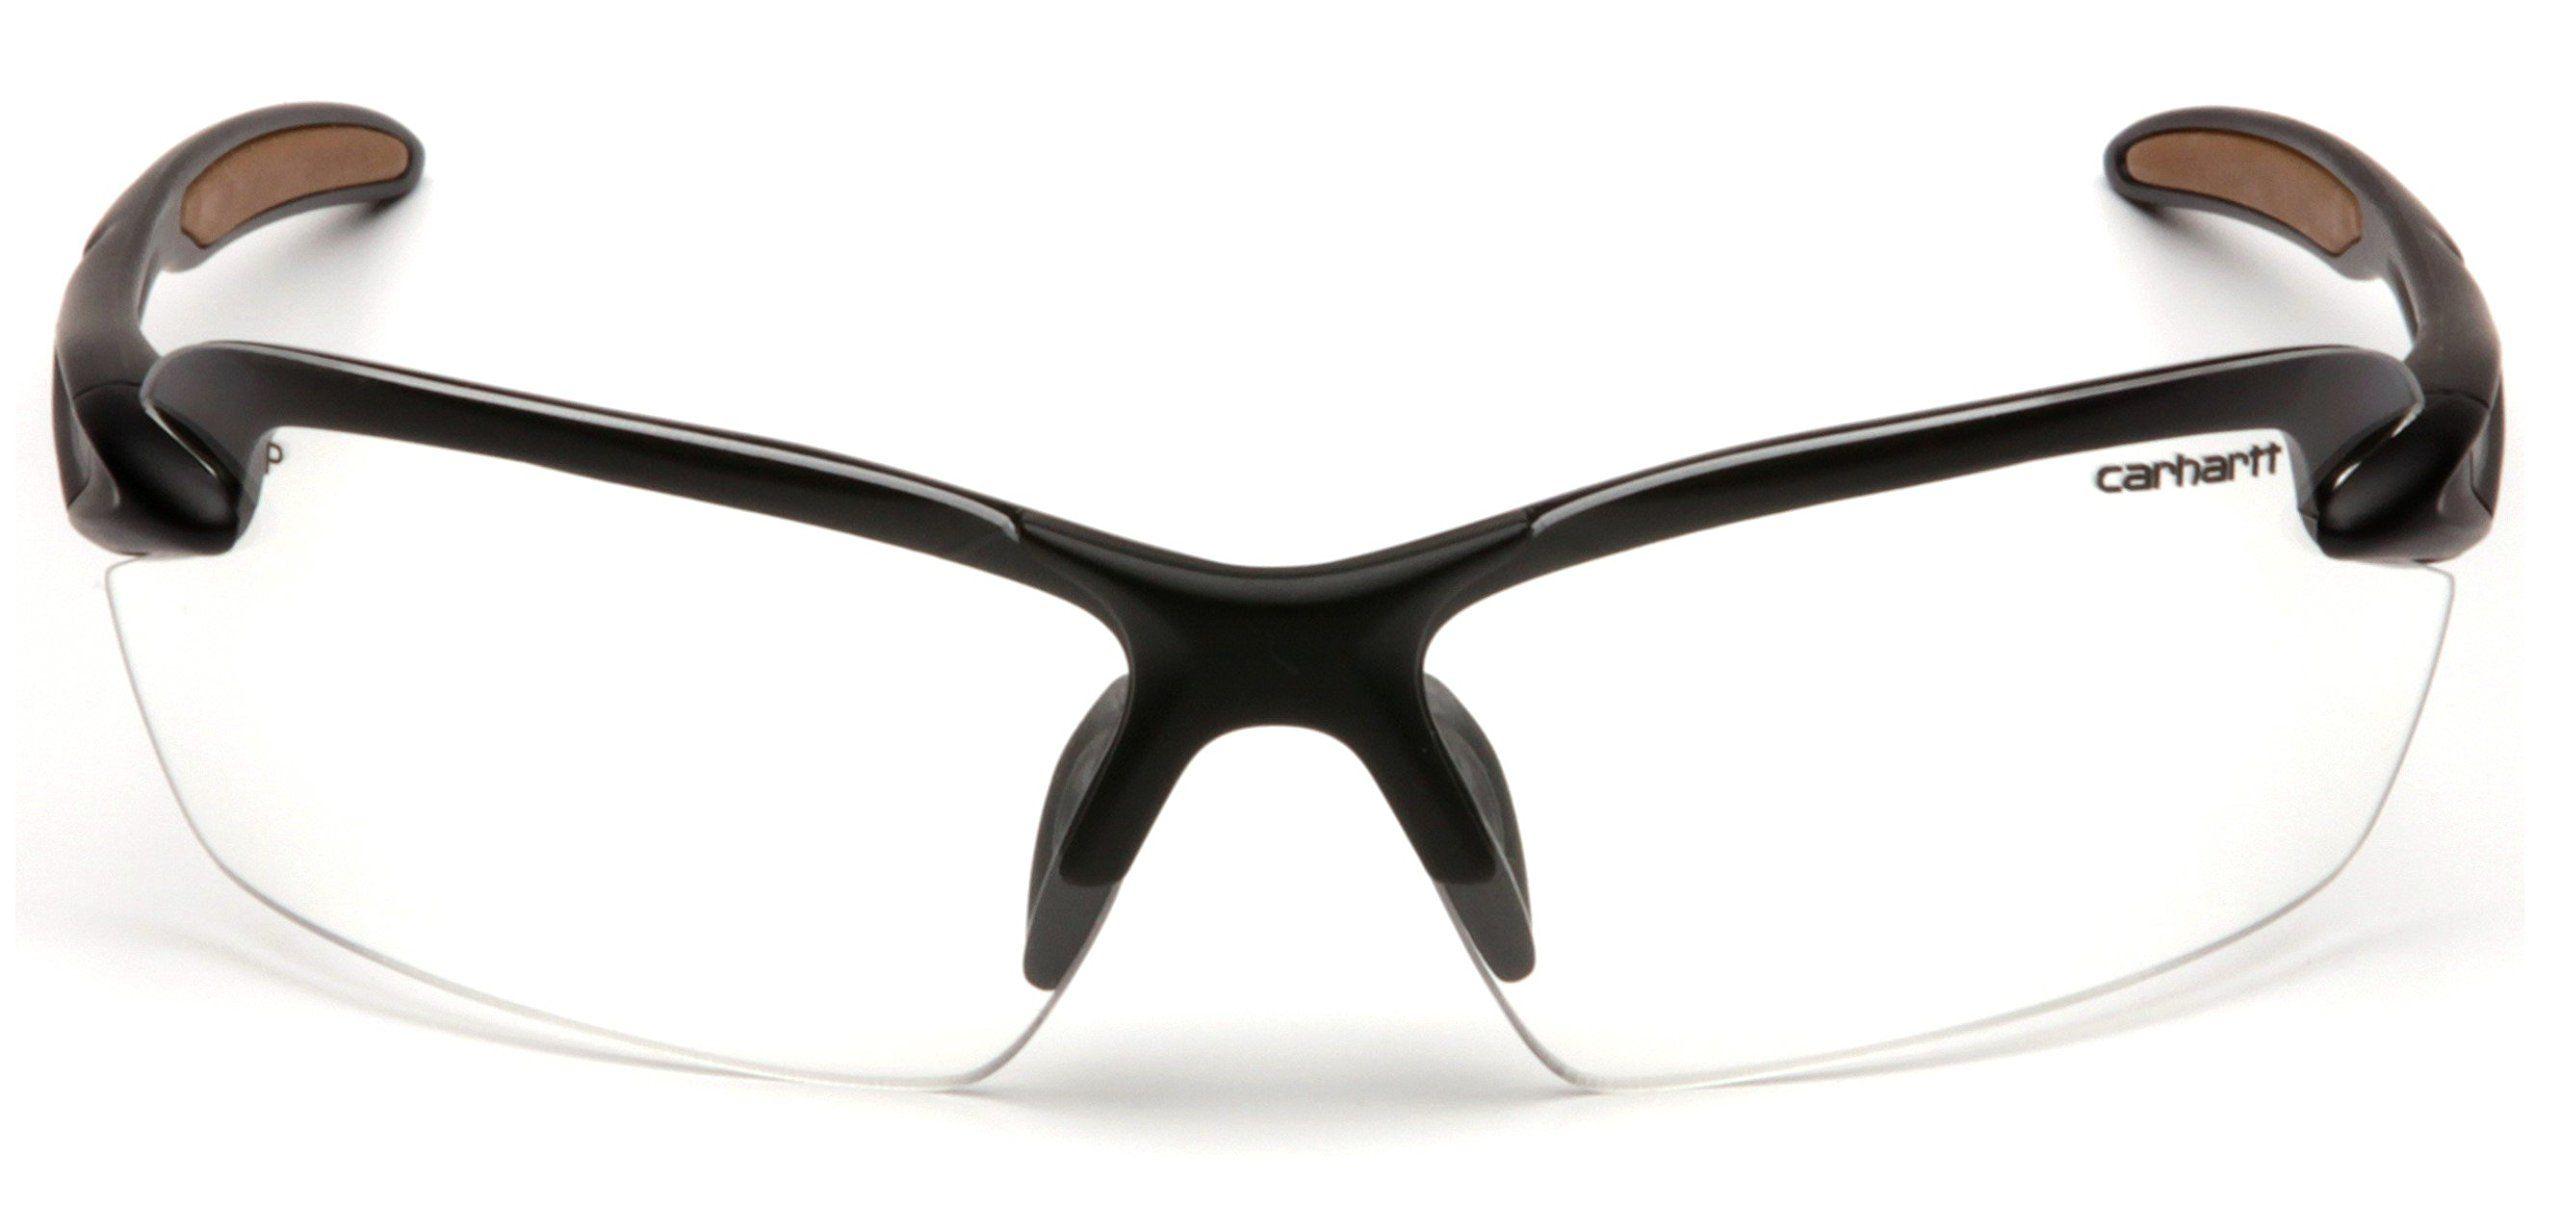 Carhartt spokane safety glasses ad spokane sponsored